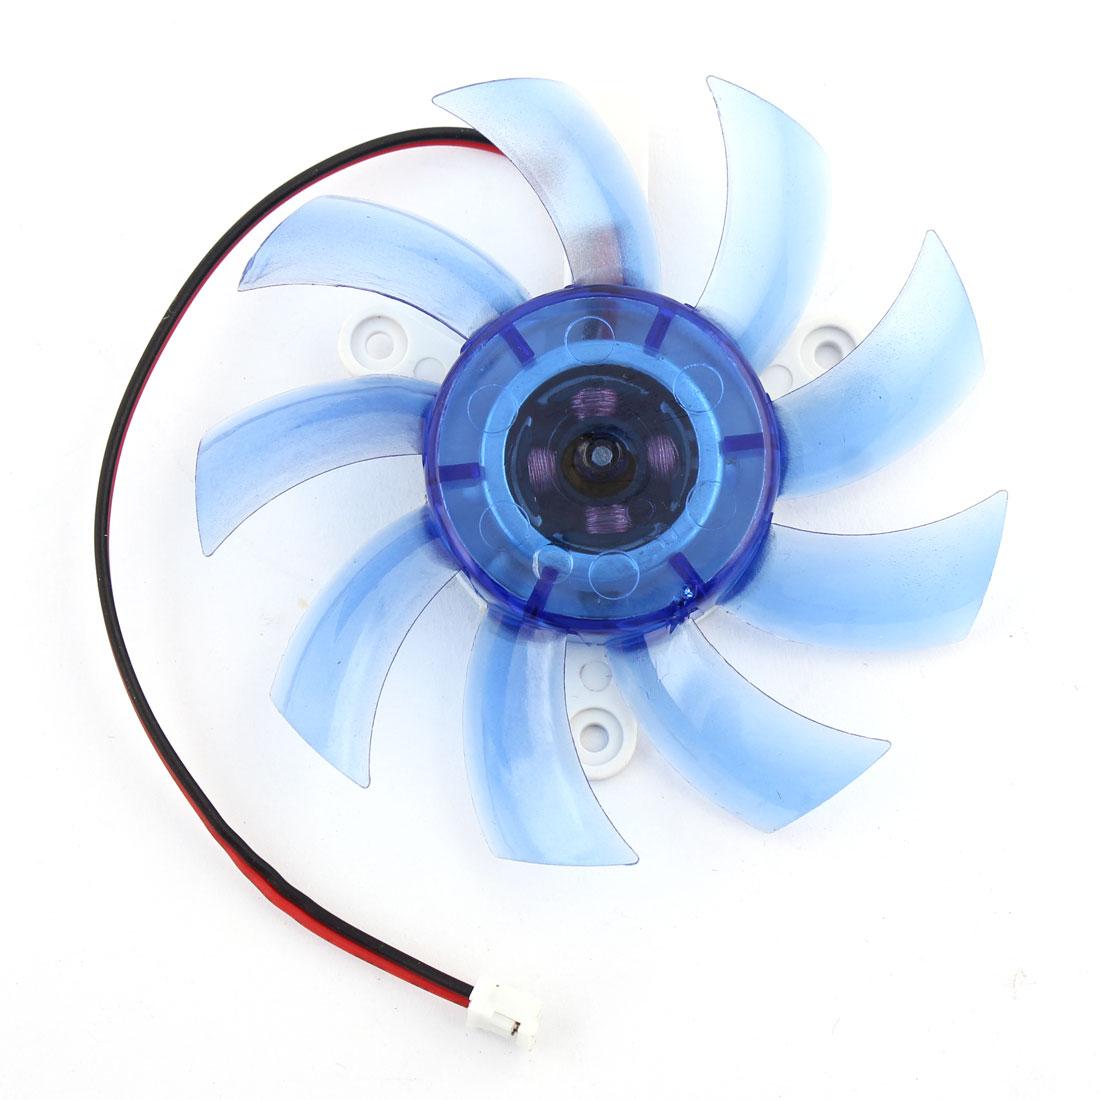 DC 12V Computer 2 Terminals Connector VGA Cooler Cooling Fan Blue